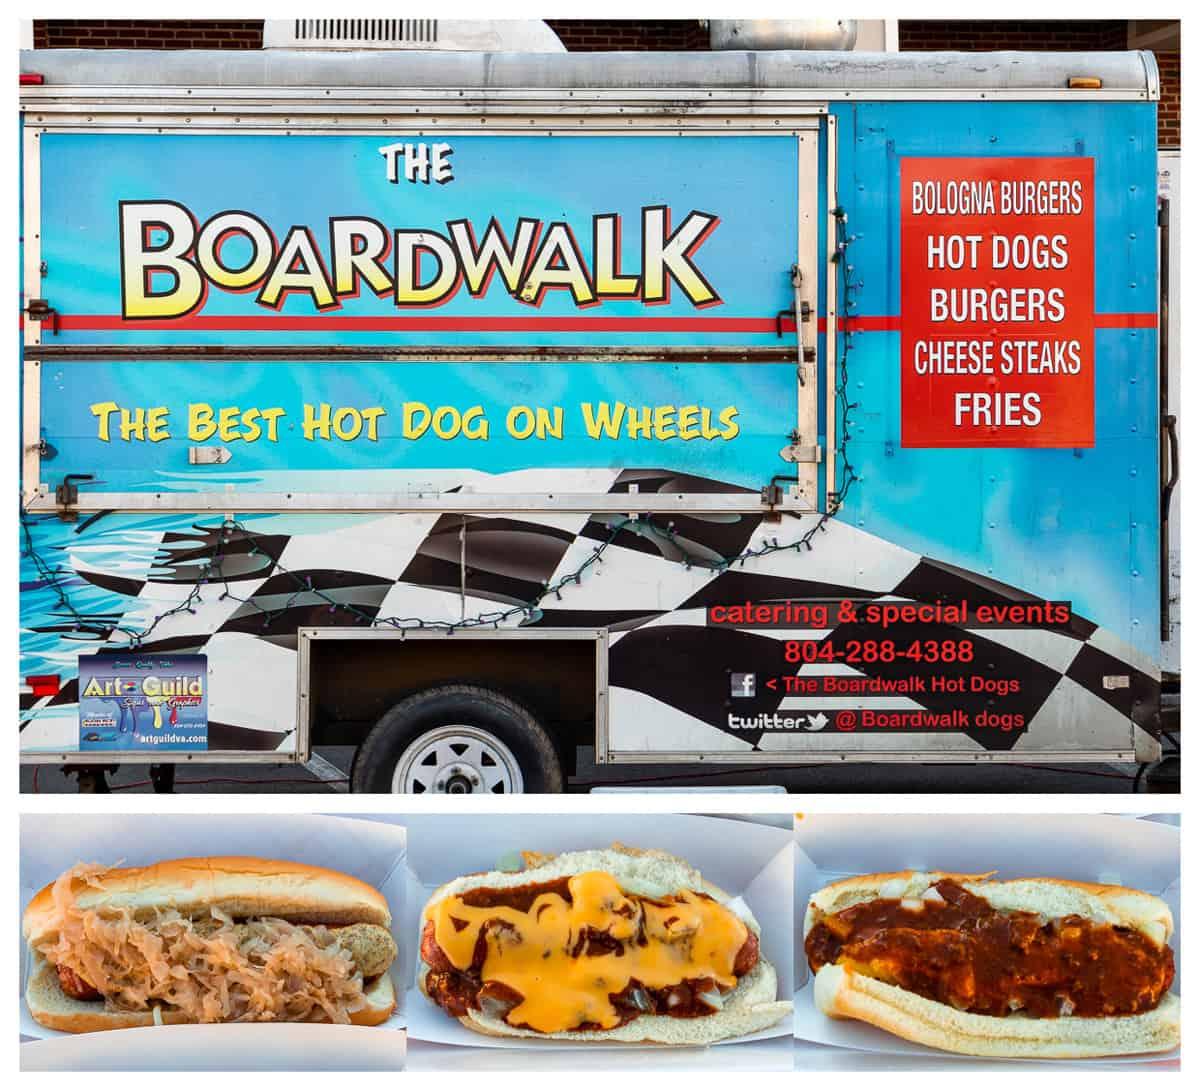 RVA food trucks: The Boardwalk food truck and hot dogs